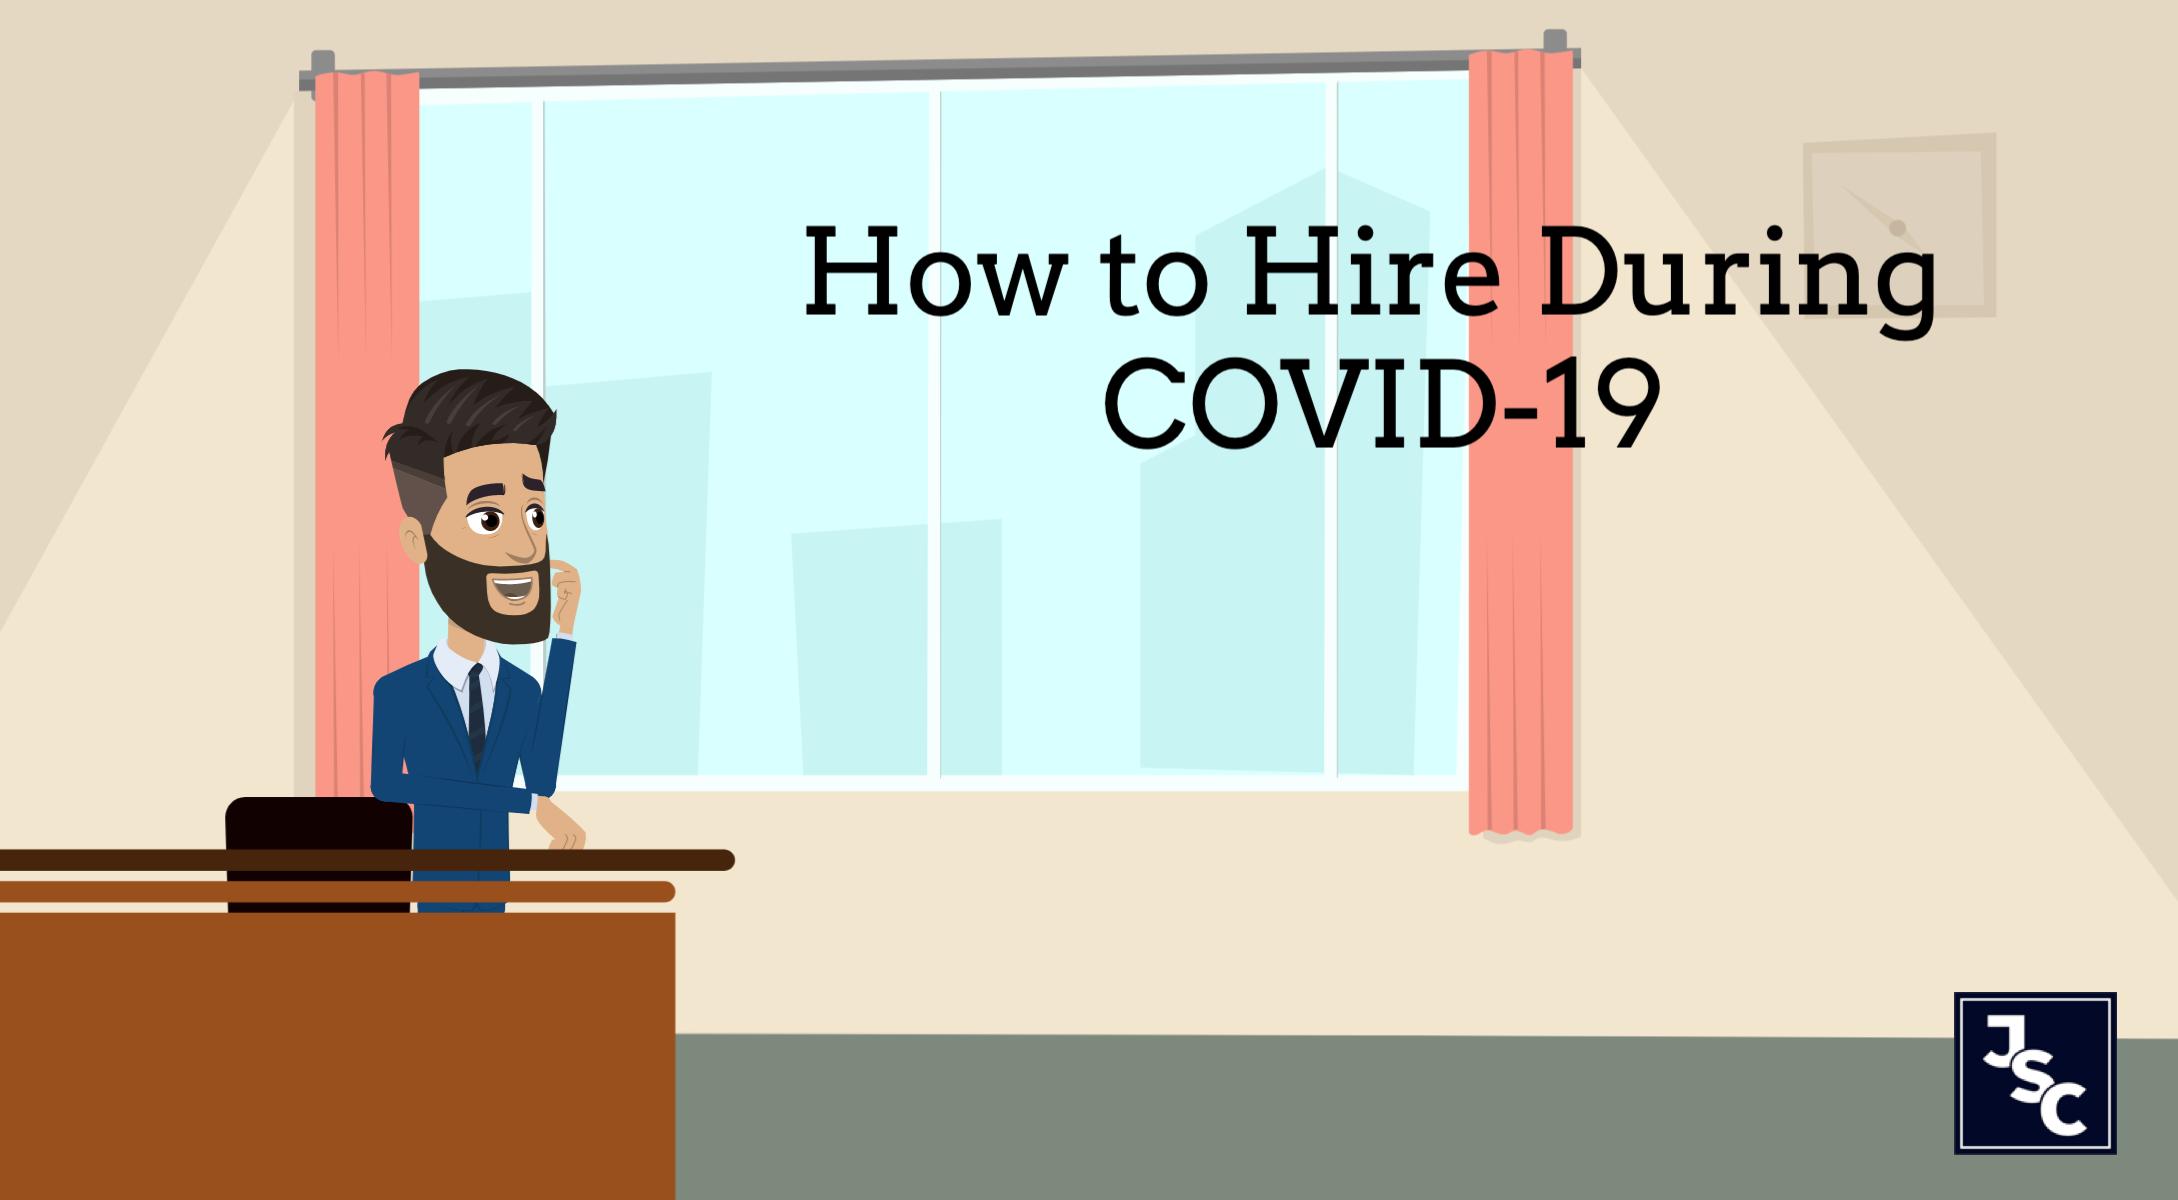 Hiring During COVID-19